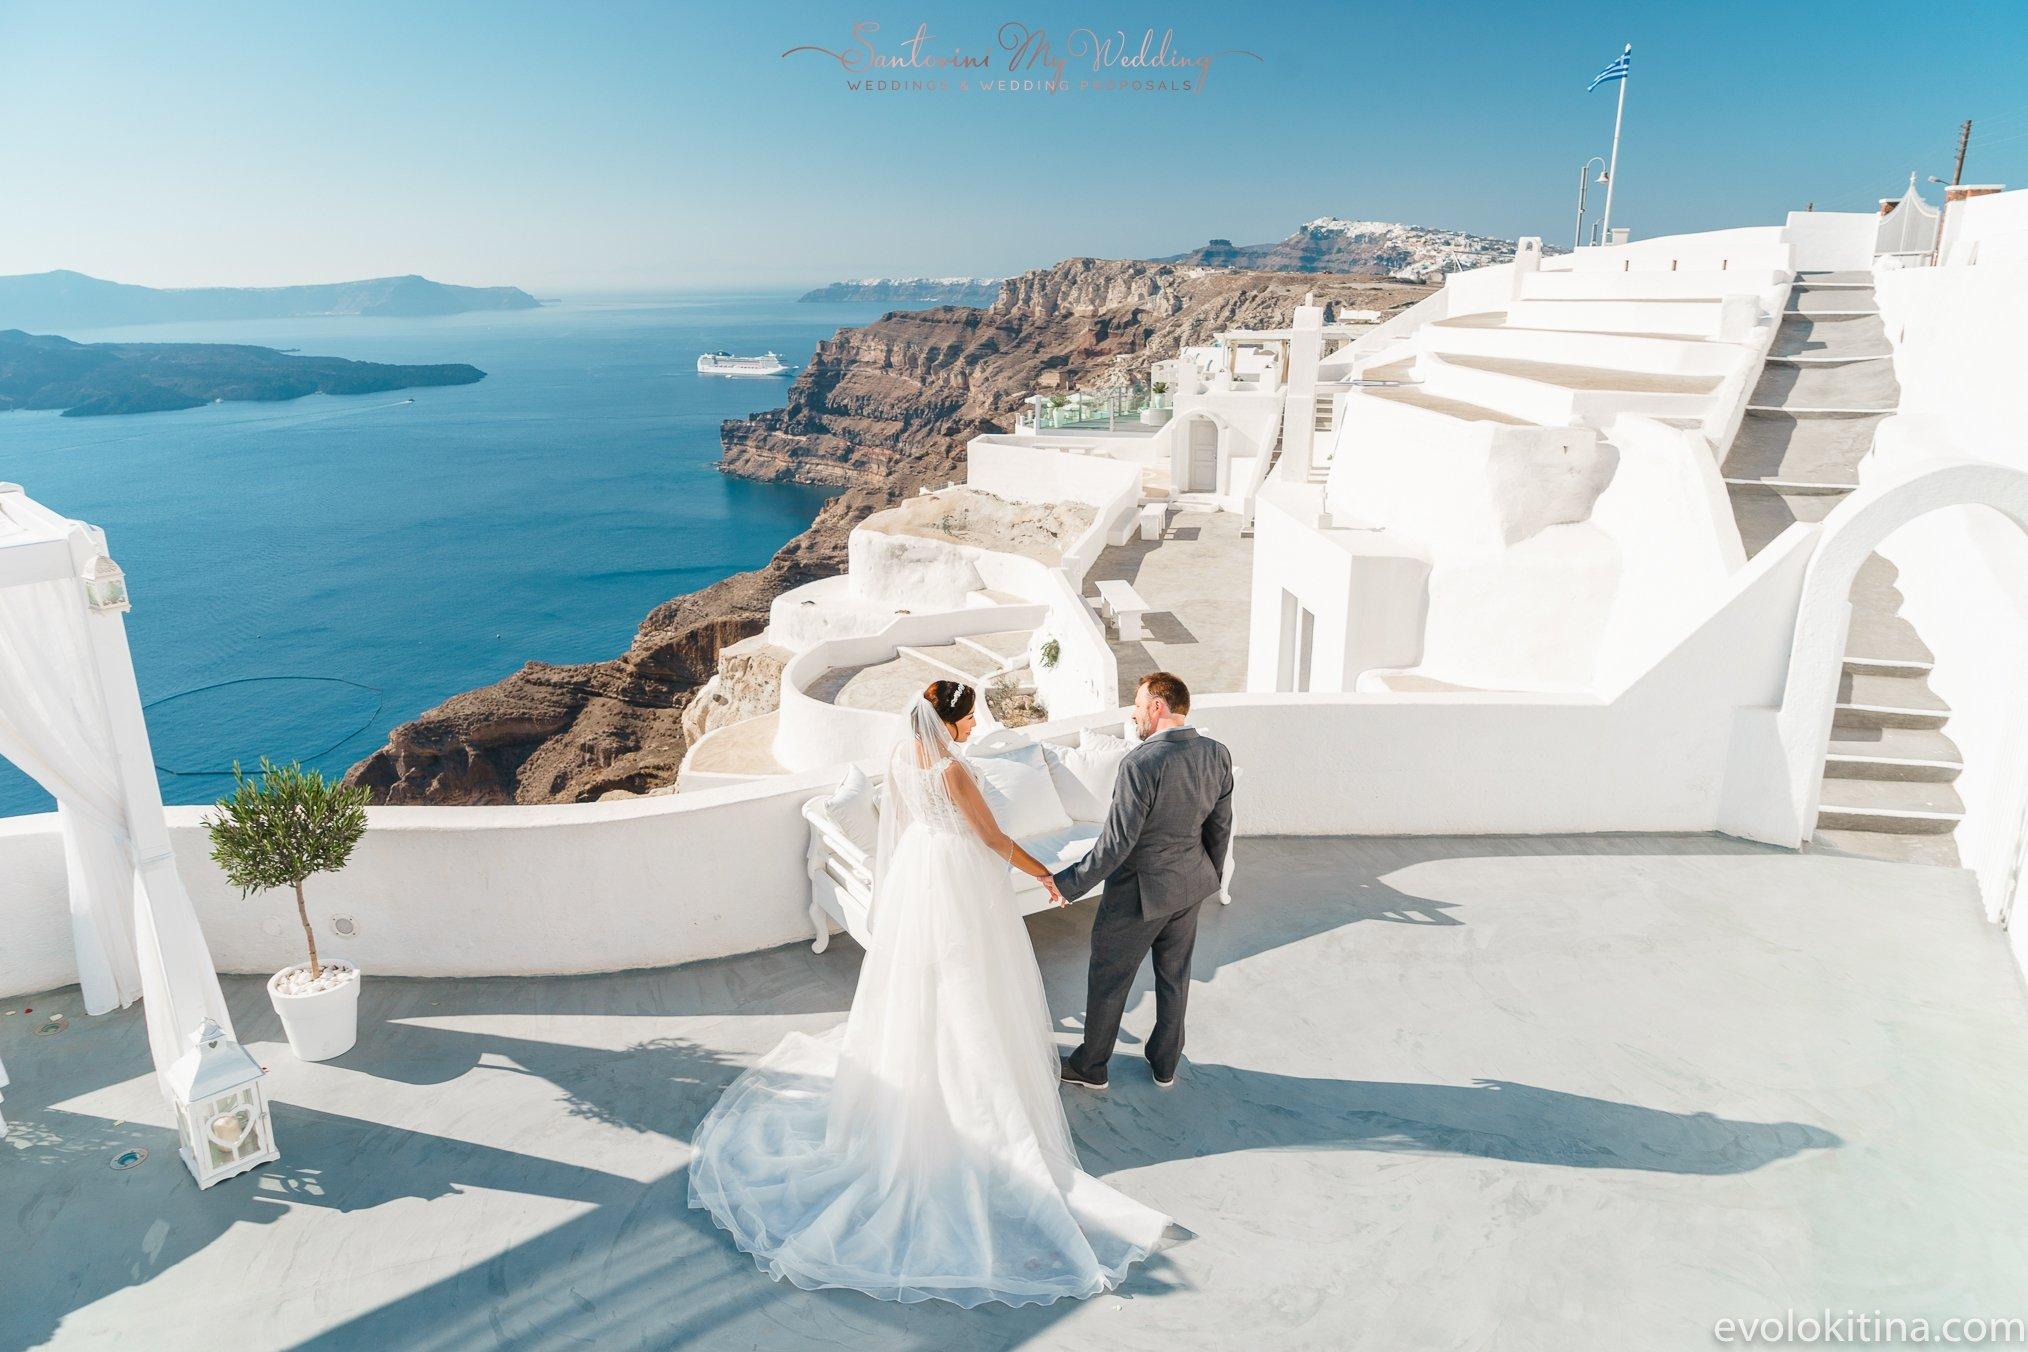 Santa Irini Santorinimywedding